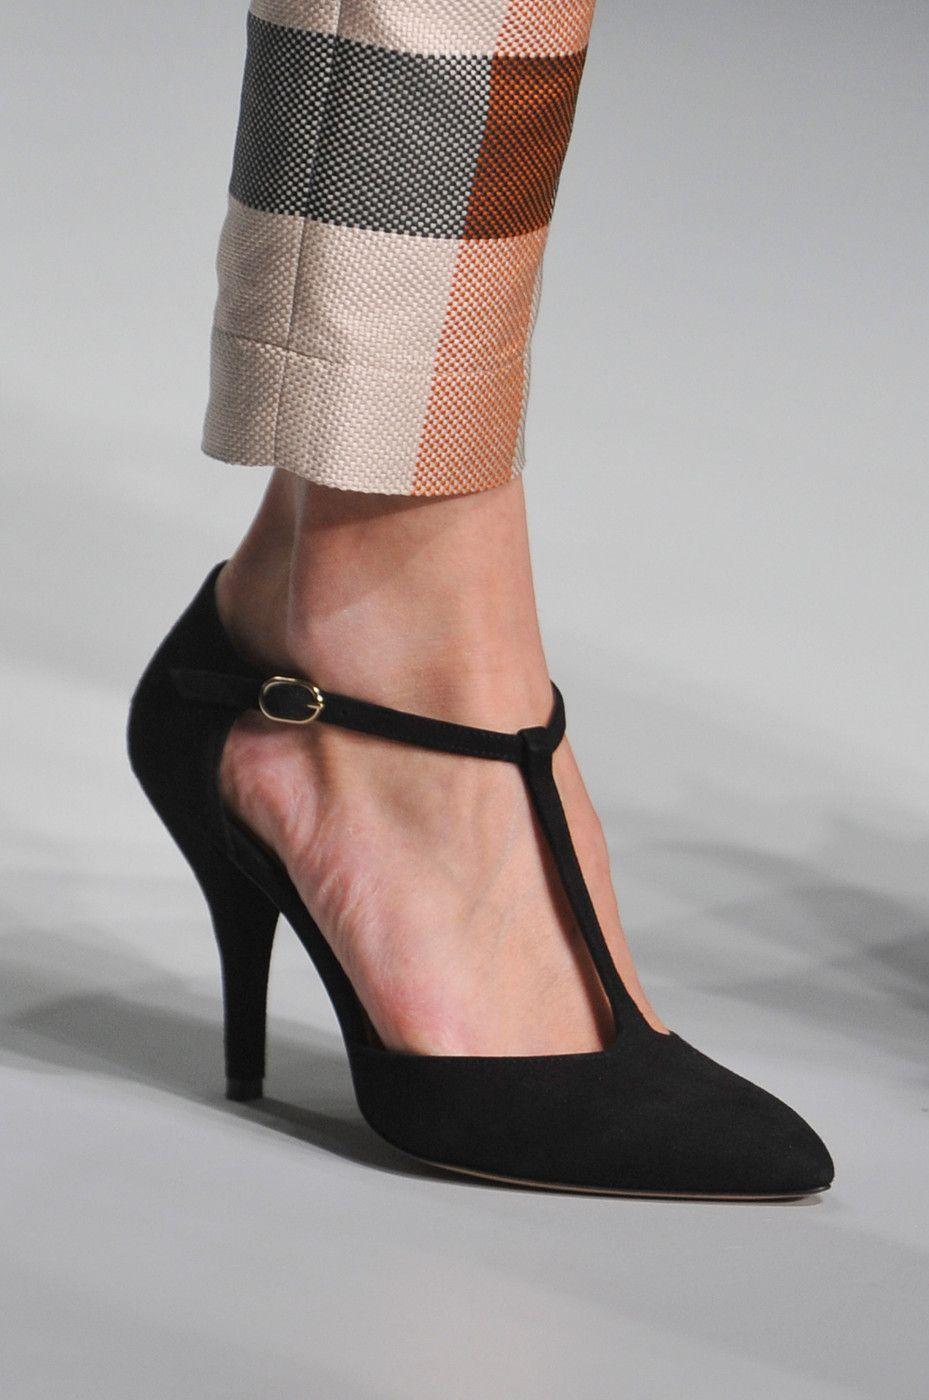 Daks At London Fashion Week Spring 2014 Chic Shoes Daks Heels